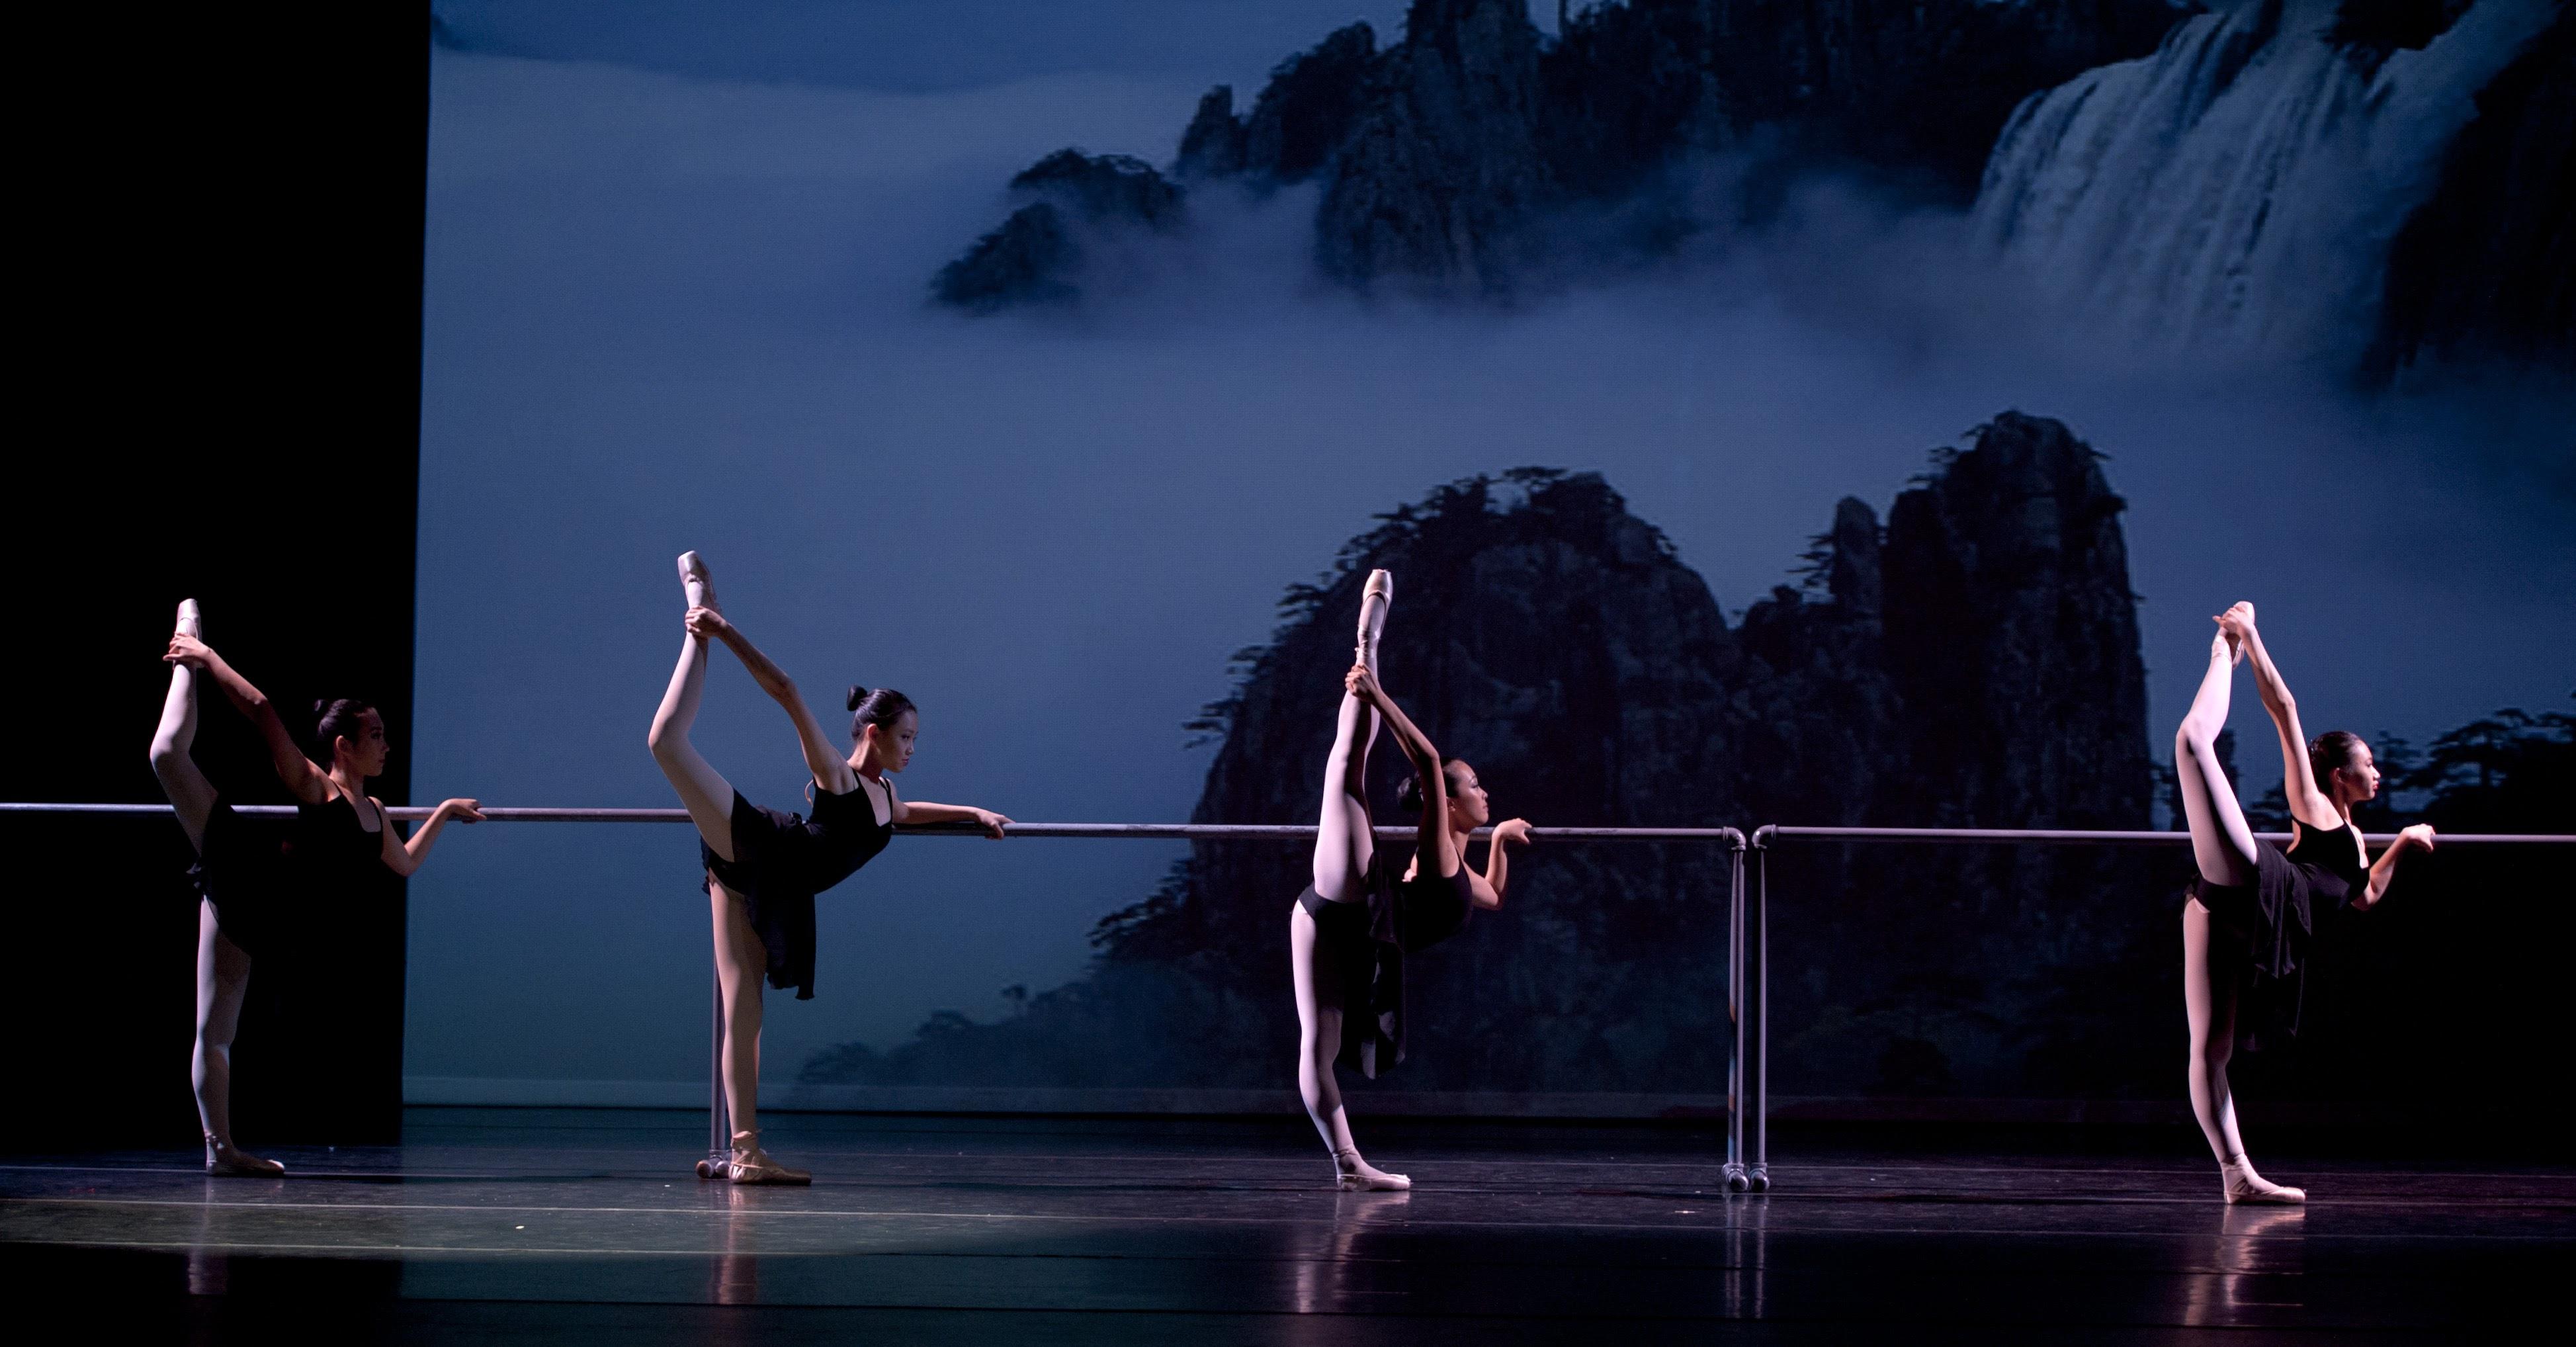 Into the Dance Hall《走進舞蹈的殿堂》